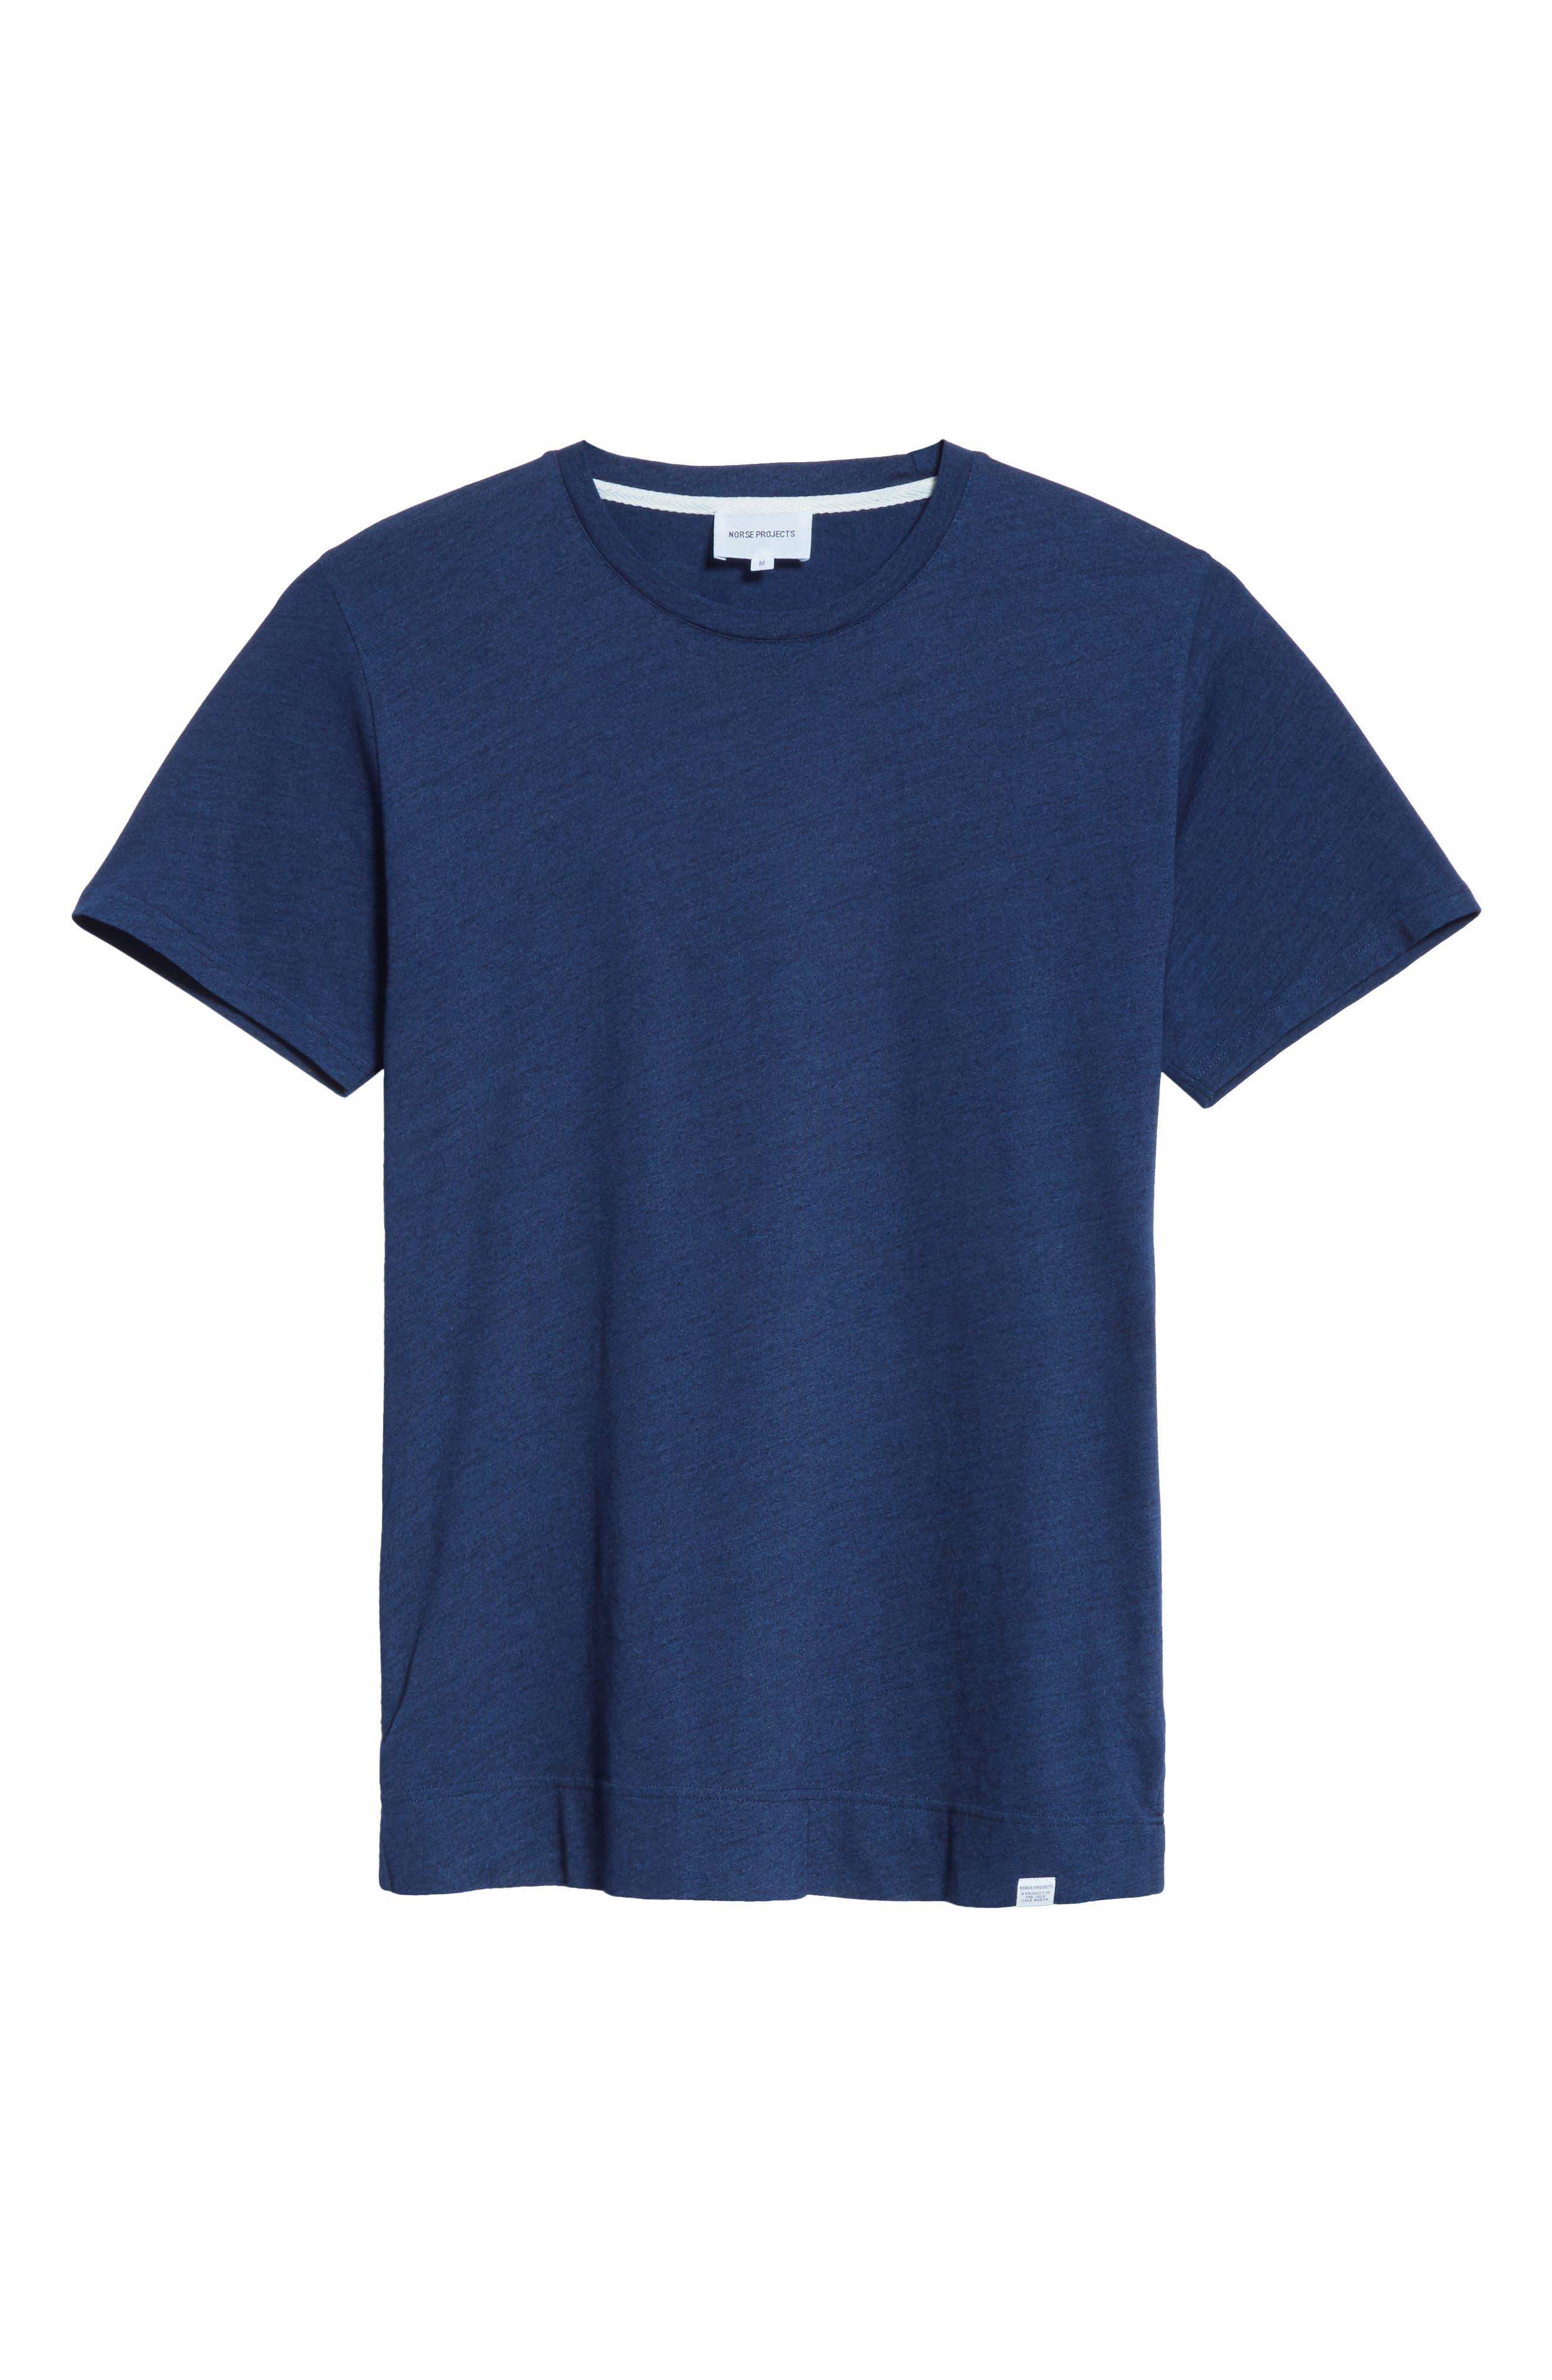 Niels Indigo T-Shirt,                             Alternate thumbnail 6, color,                             Indigo